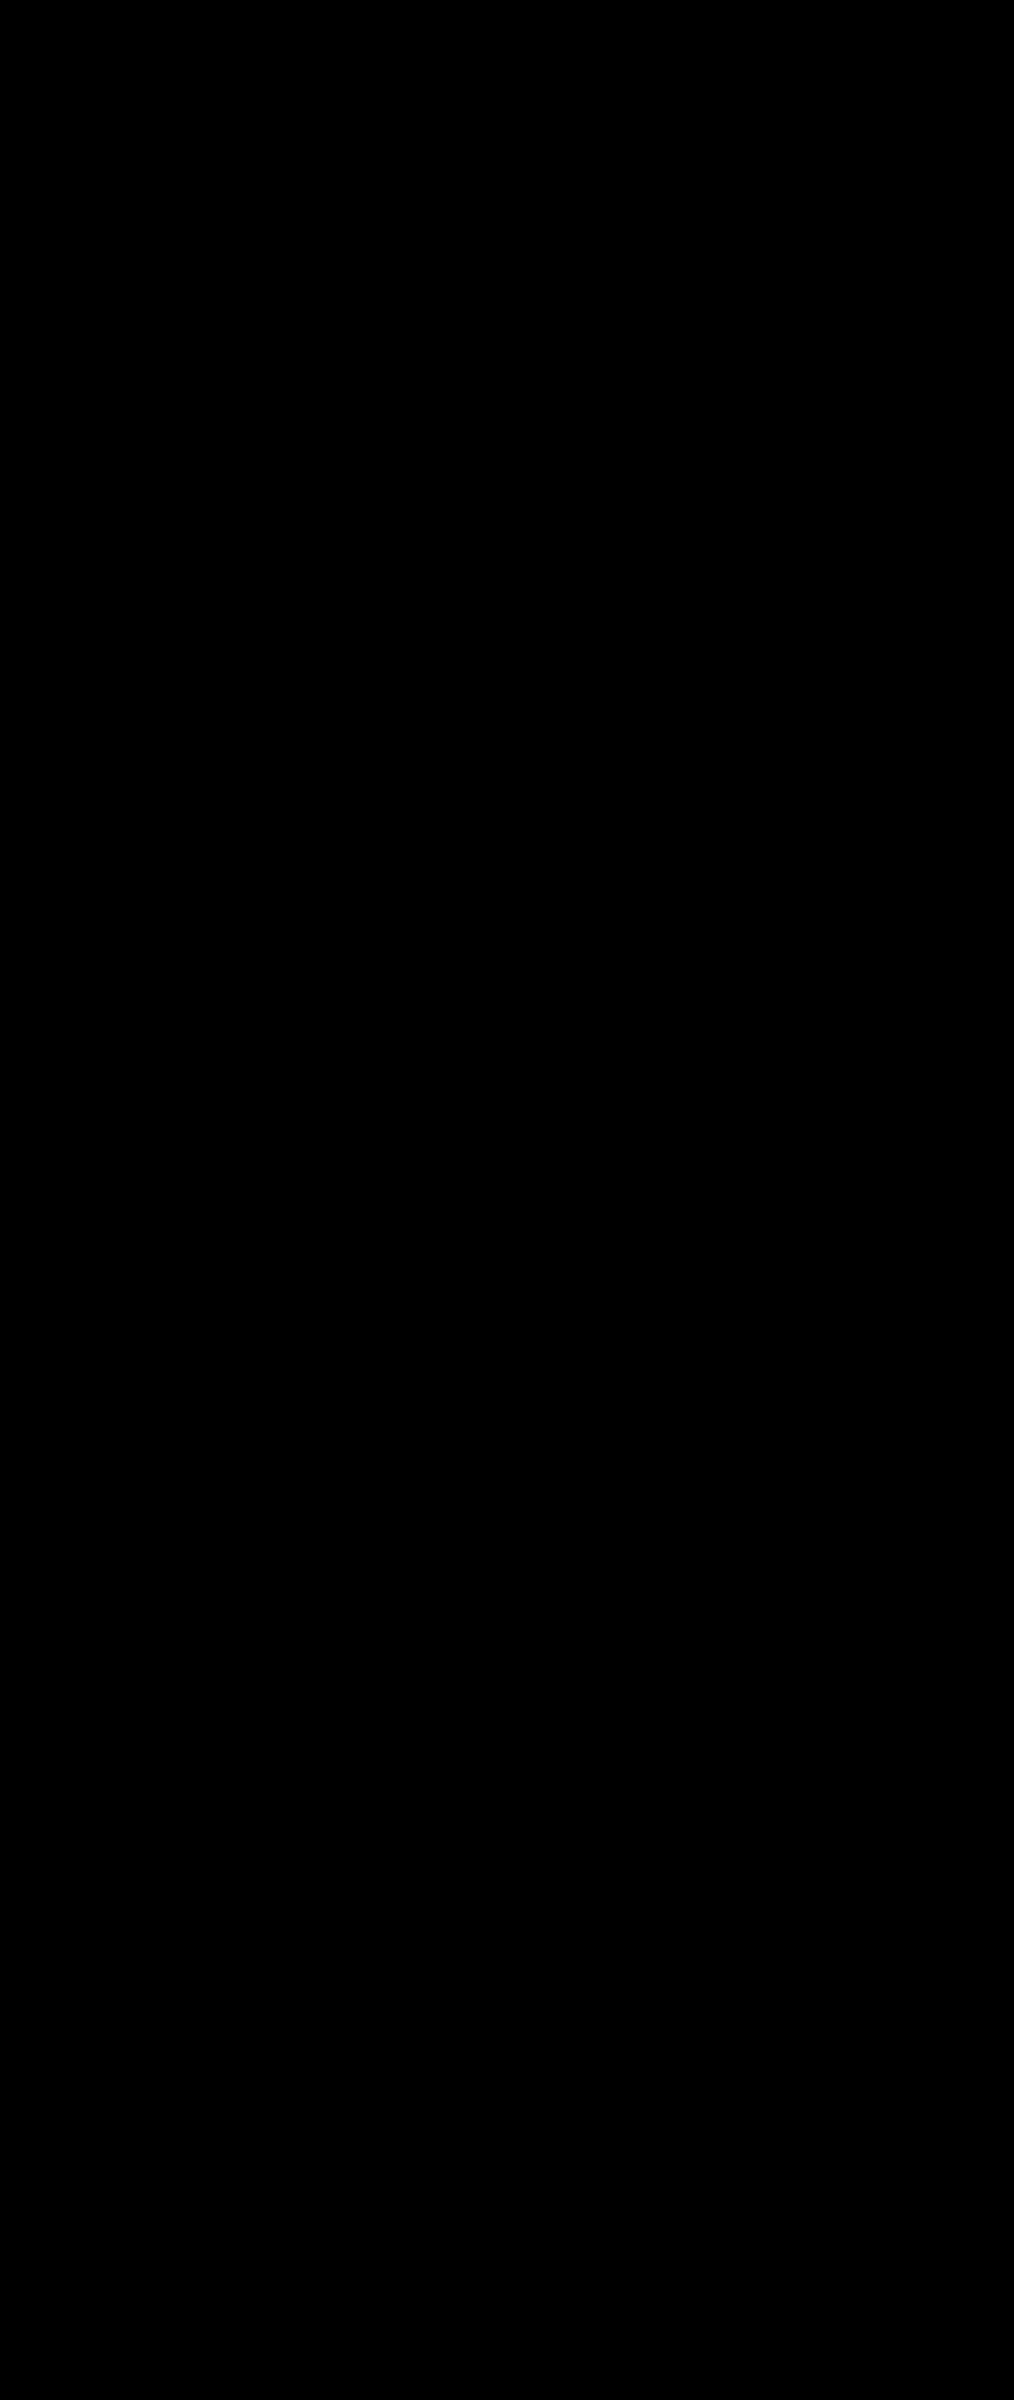 Puzzle clipart shape. Tangram people black big